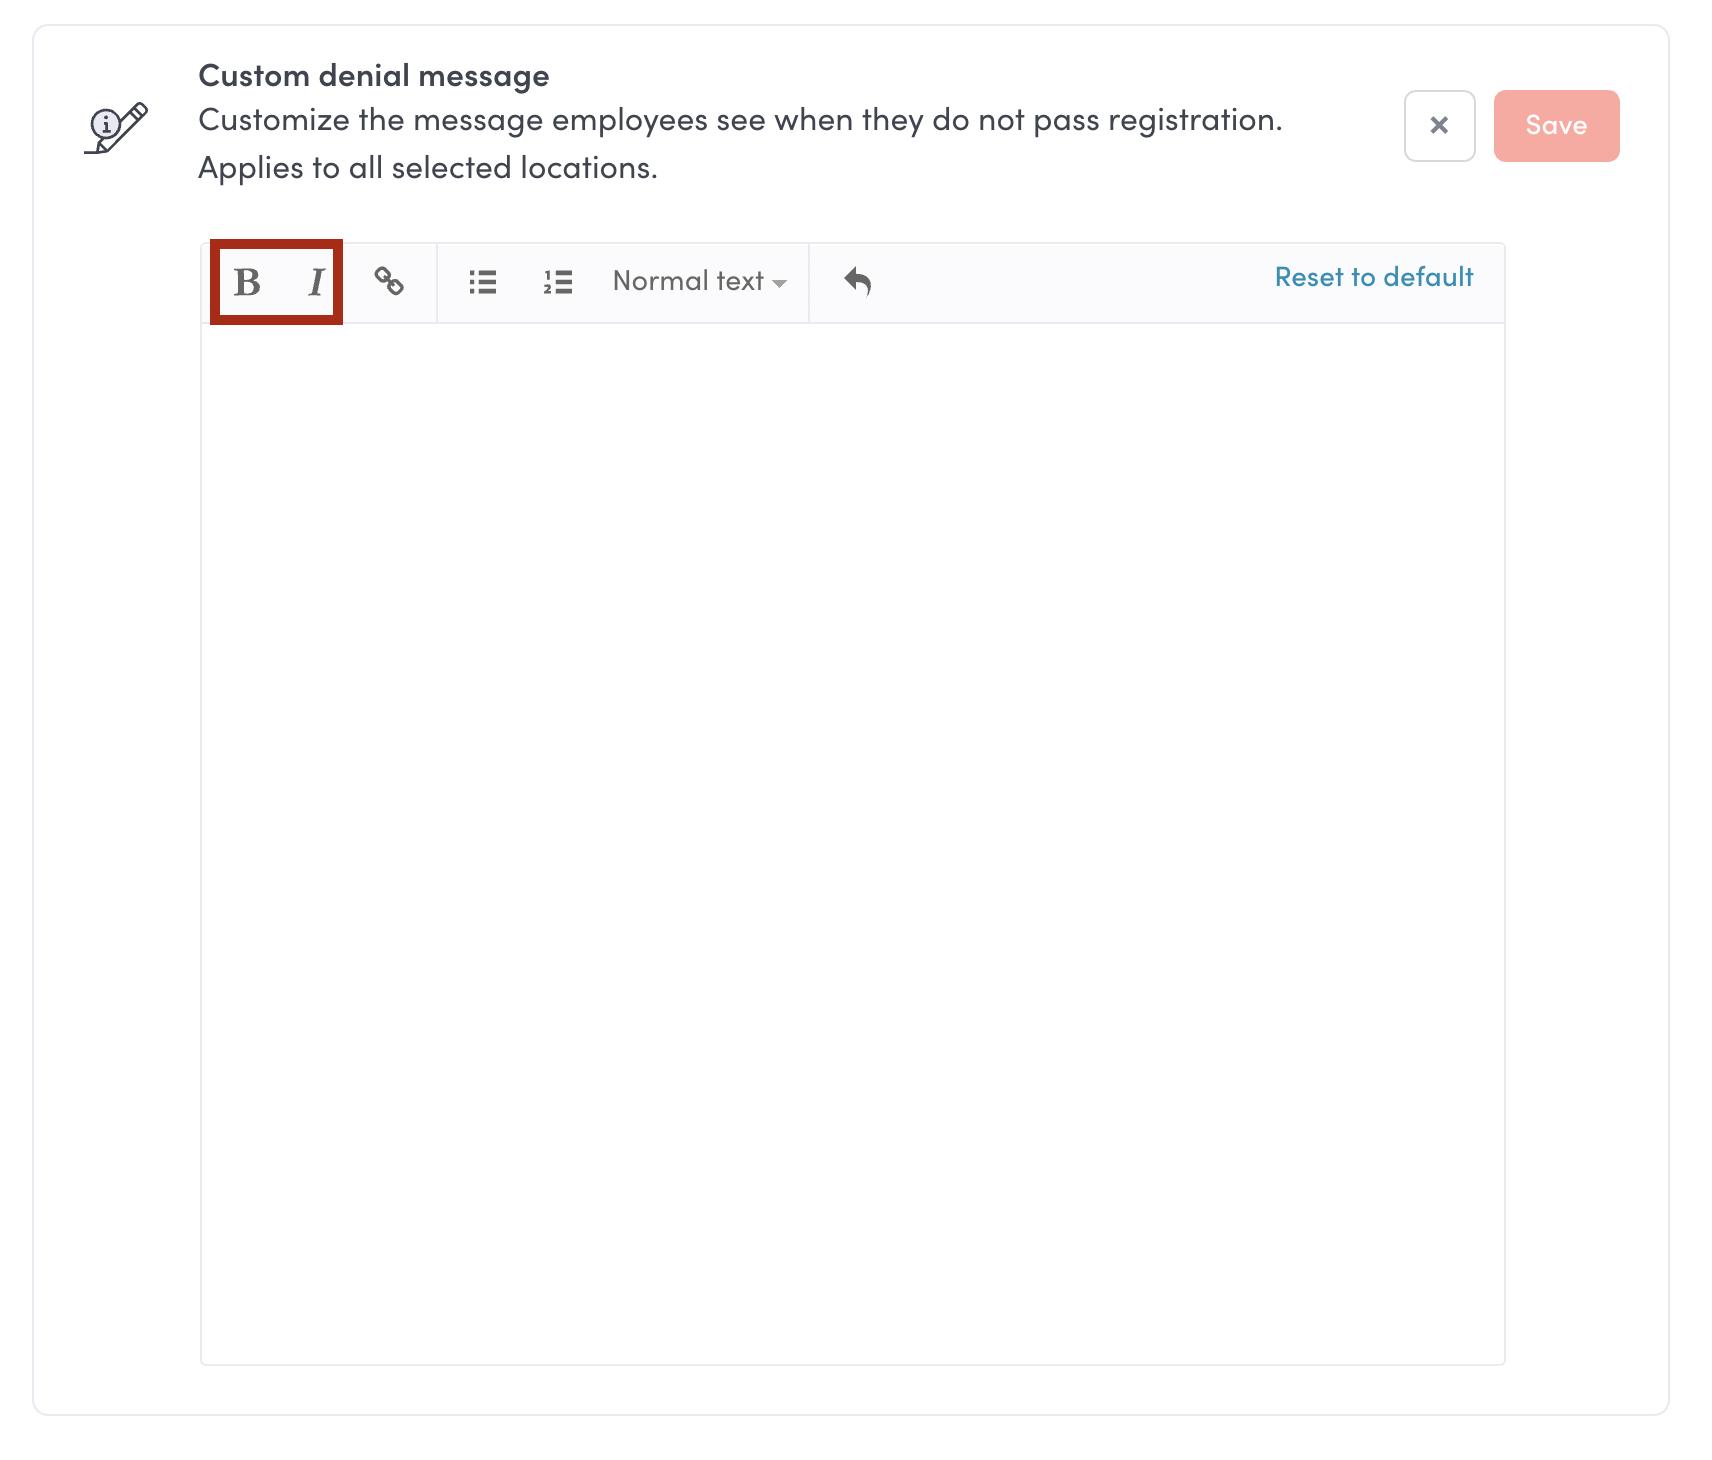 custom denial message formatting envoy